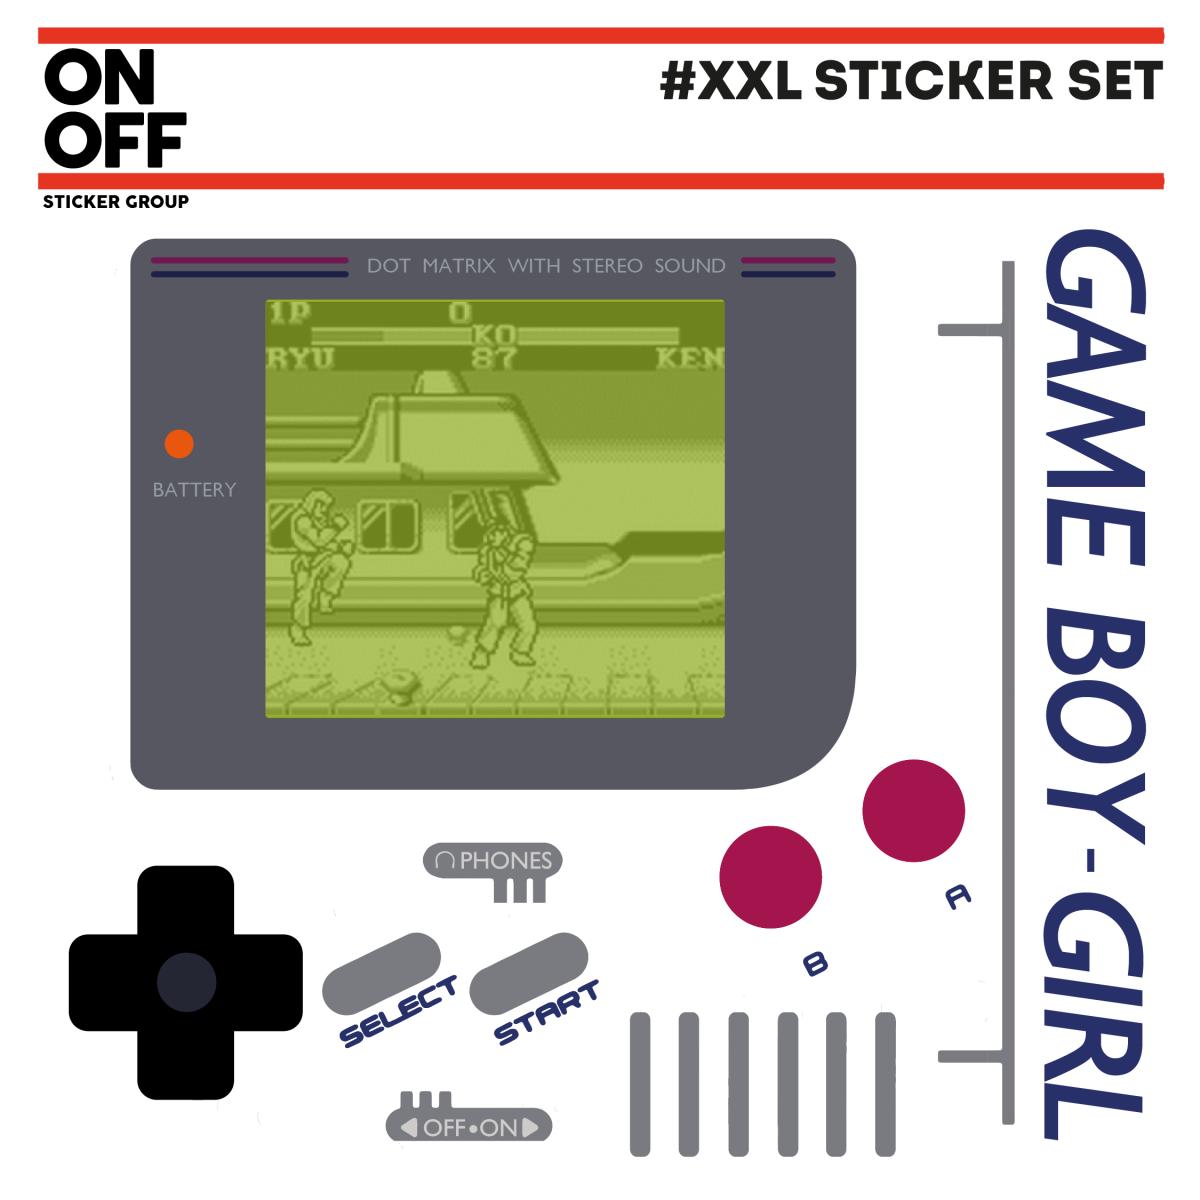 XXL STICKER SETS #gameboy #gamegirl